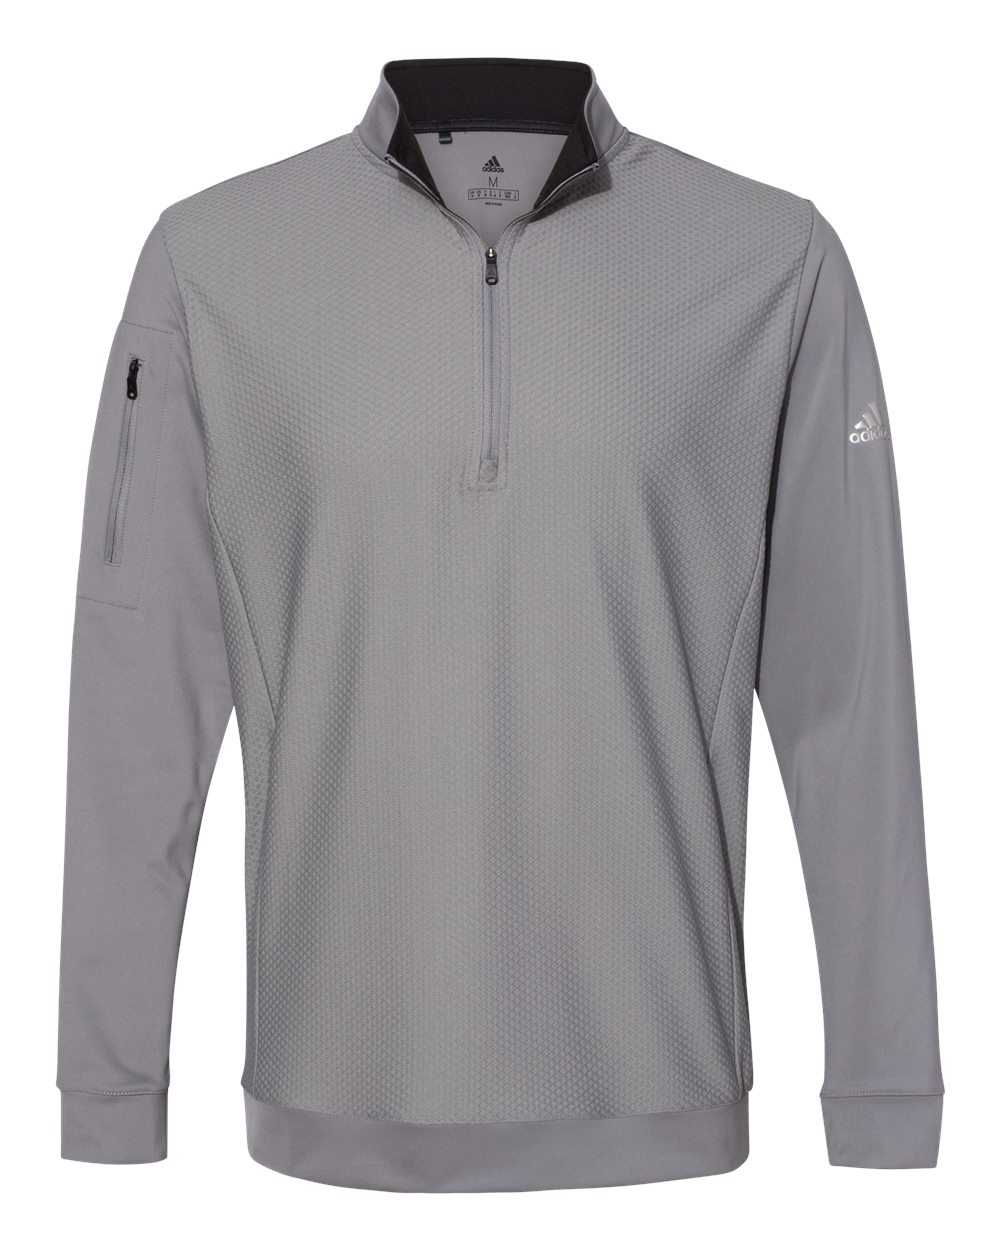 Adidas A295 - Performance Texture Quarter-Zip Pullover